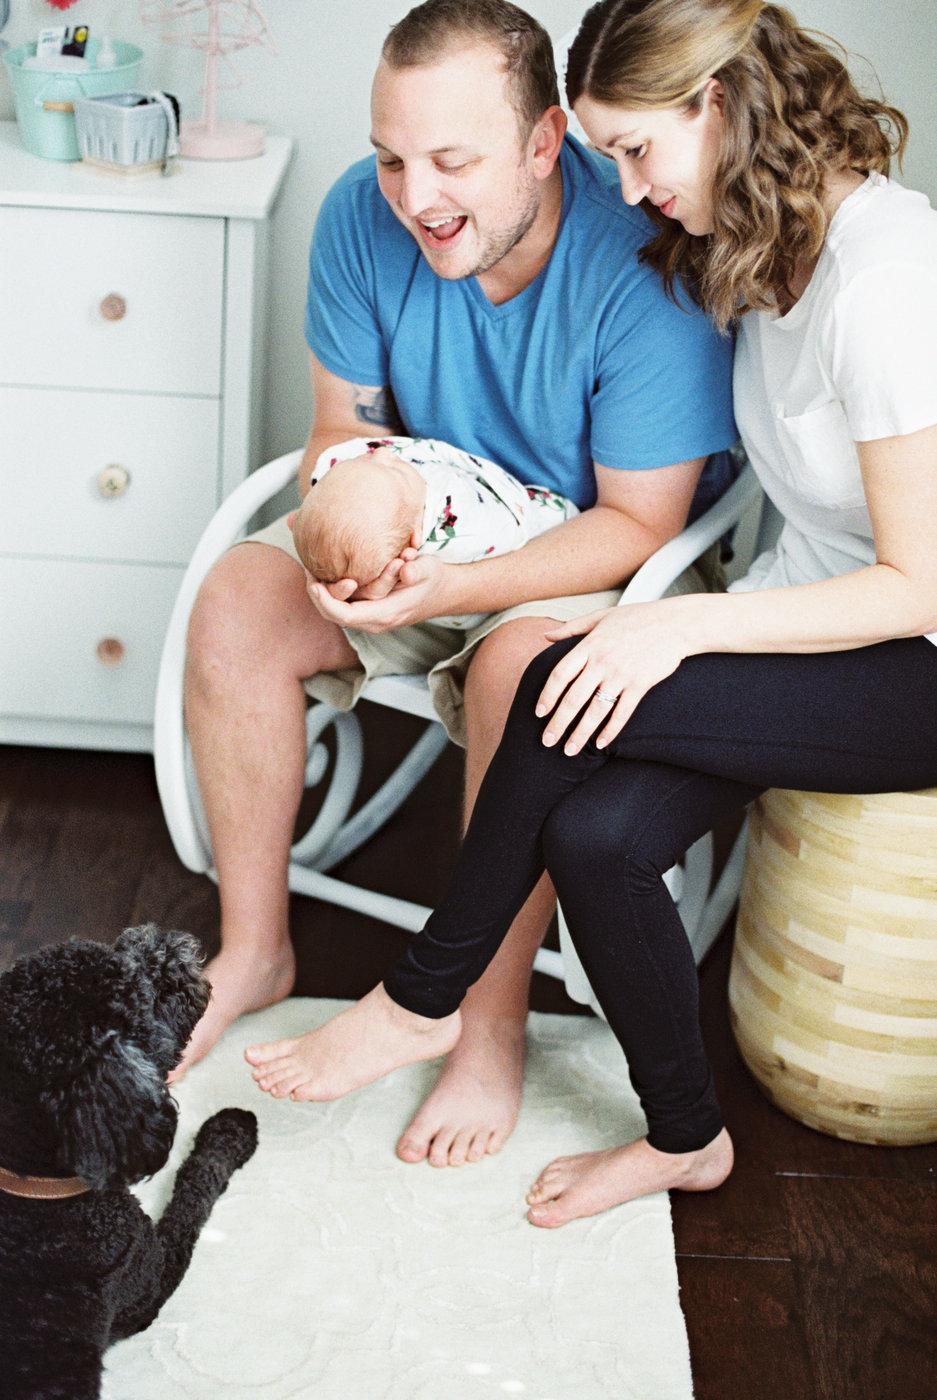 Plum Newborn Part 2-Plum Newborn Part 2-0002.jpg